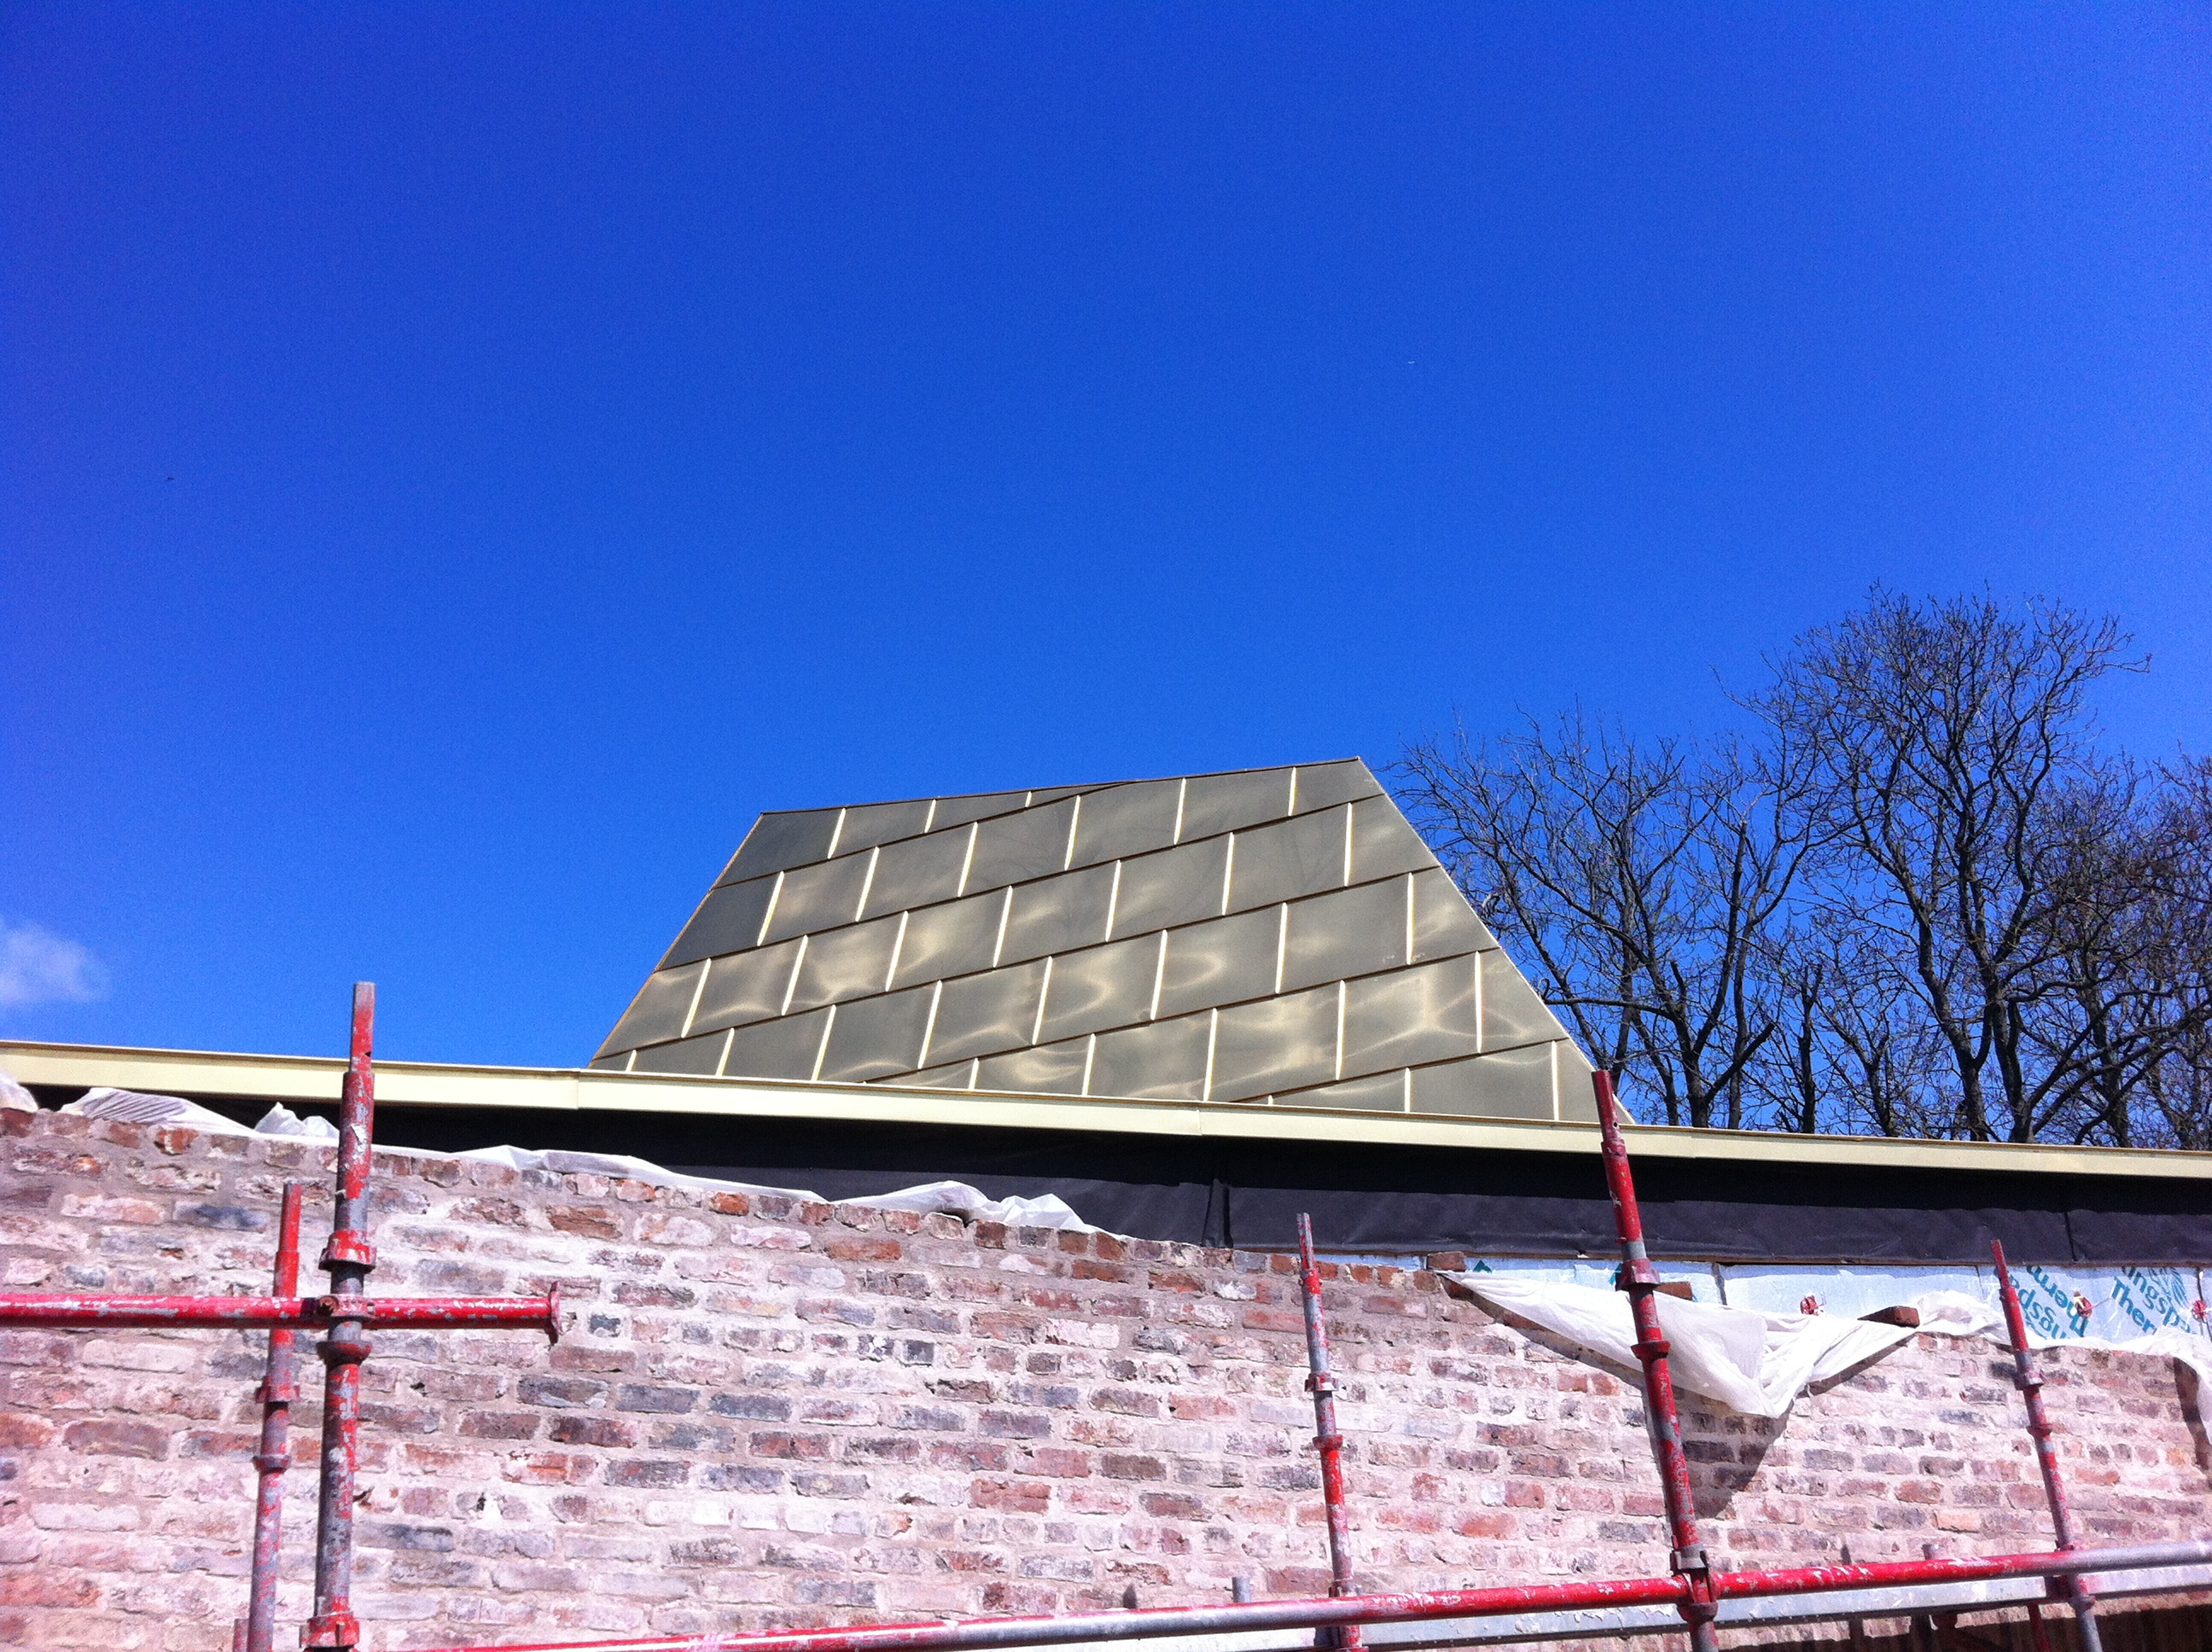 The Pavilion roof